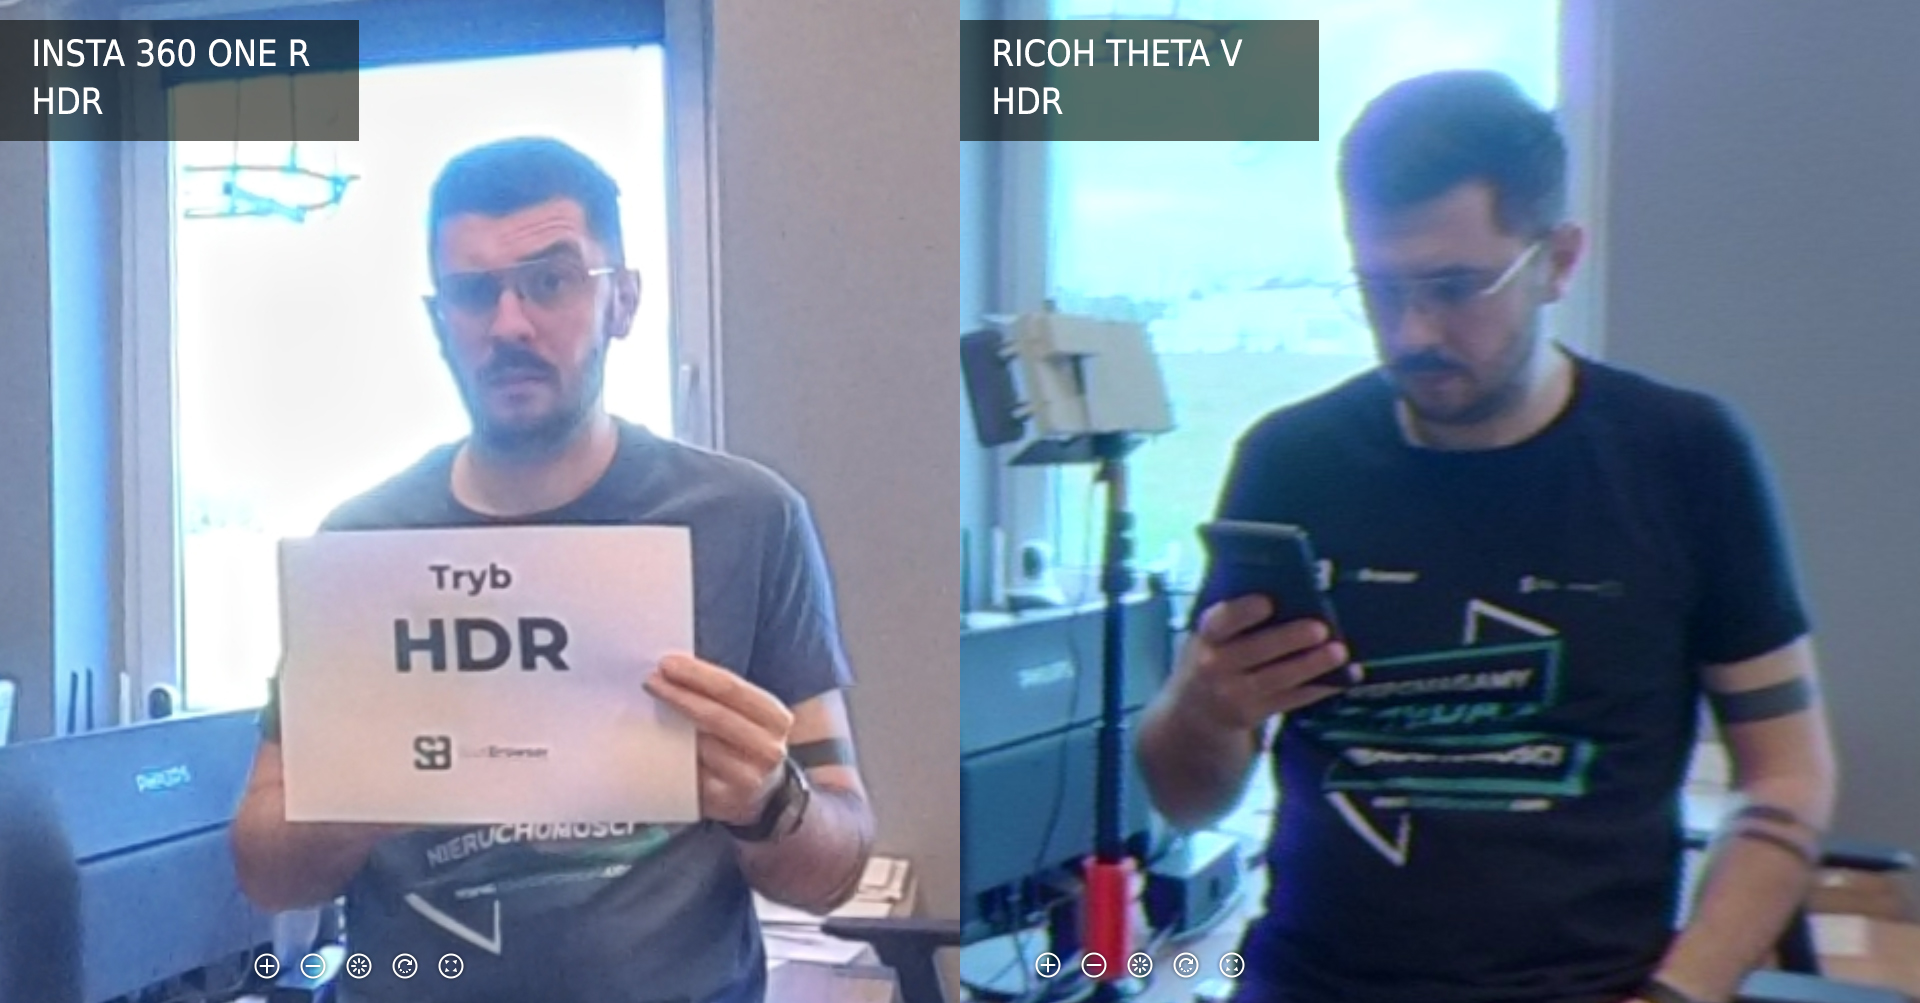 Ricoh Theta V vs Insta 360 One R tryb HDR